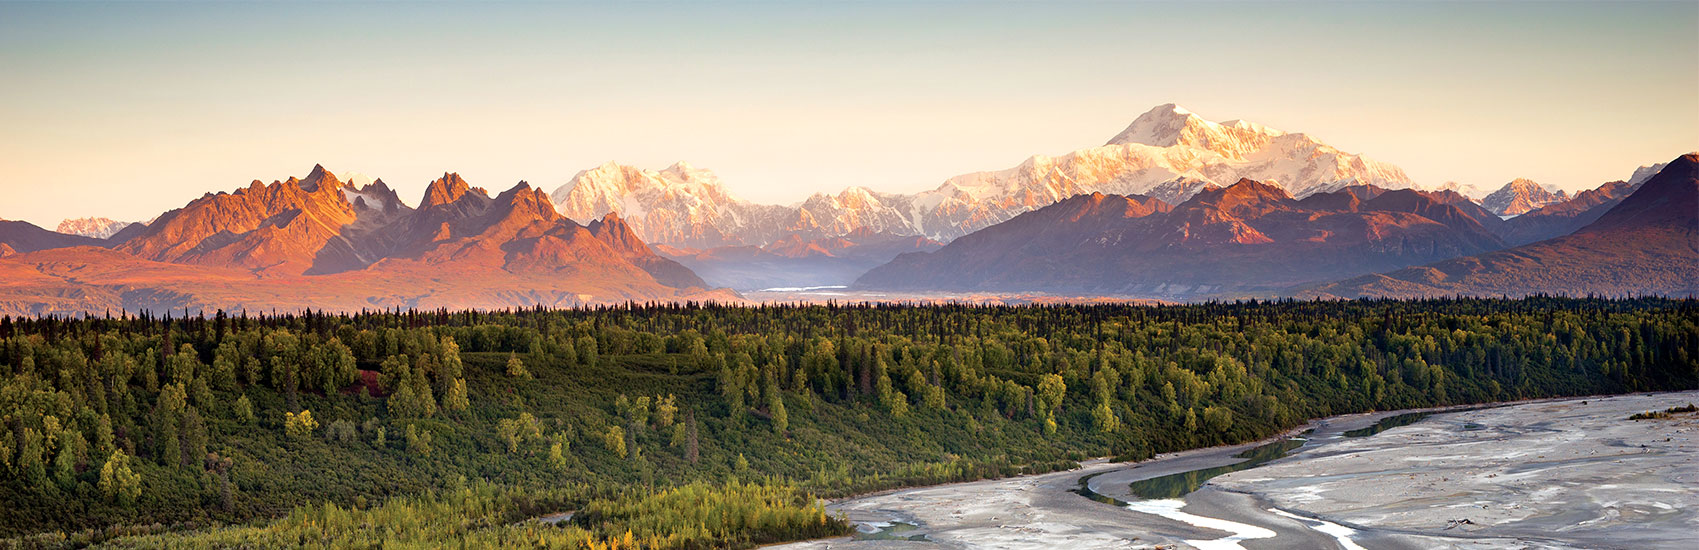 Explore Alaska with Holland America Cruise Line 3